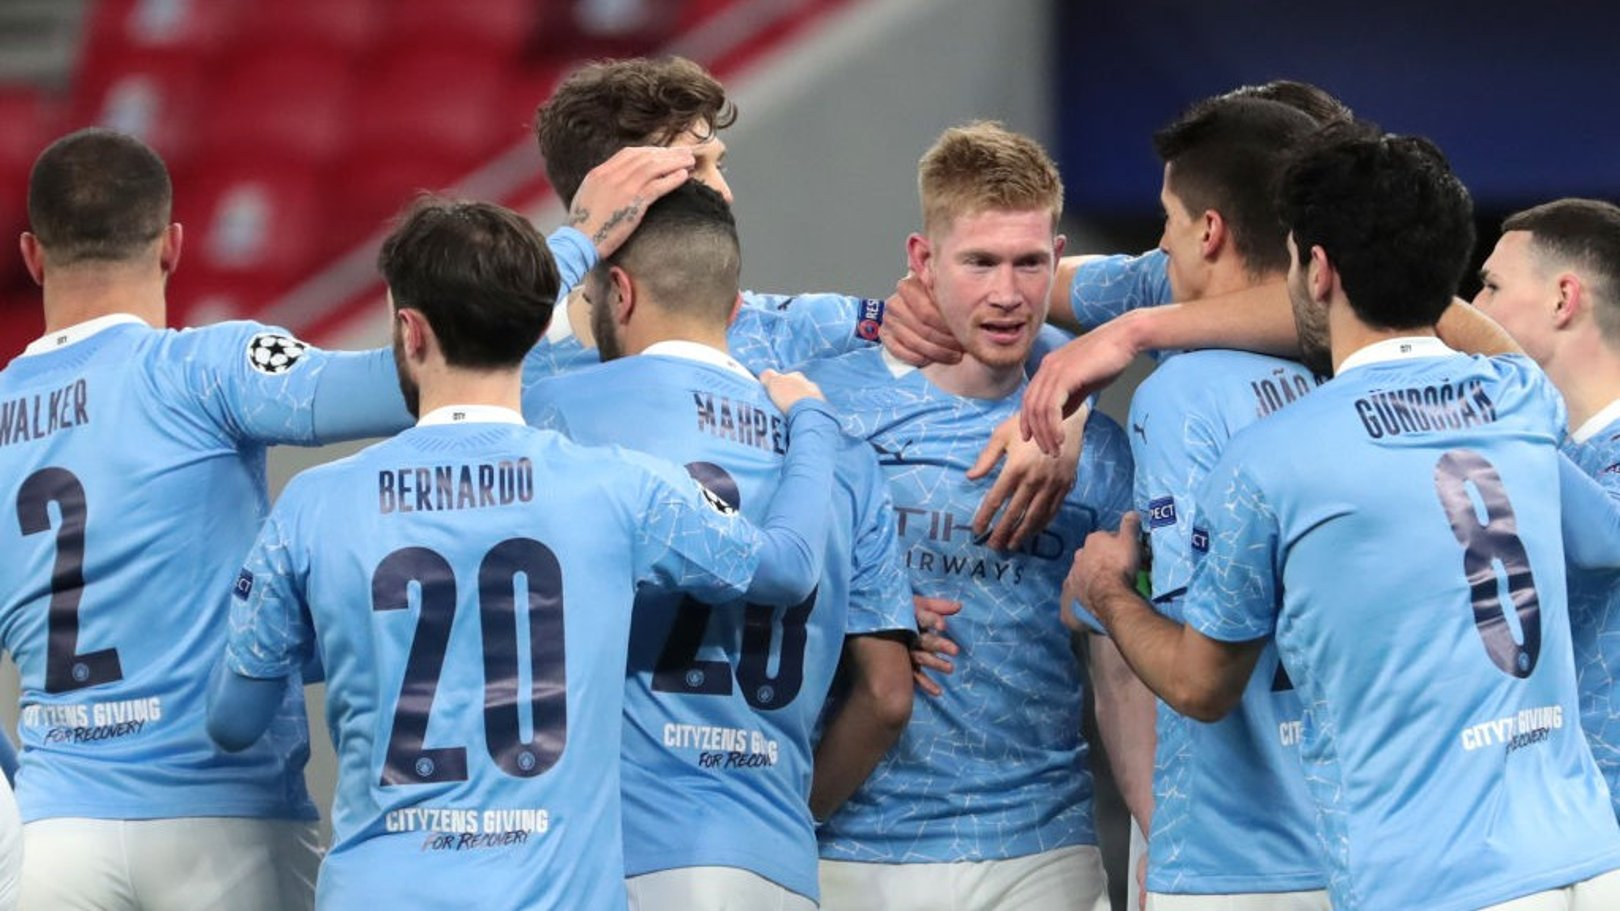 Collective effort: City's Premier League minutes played so far